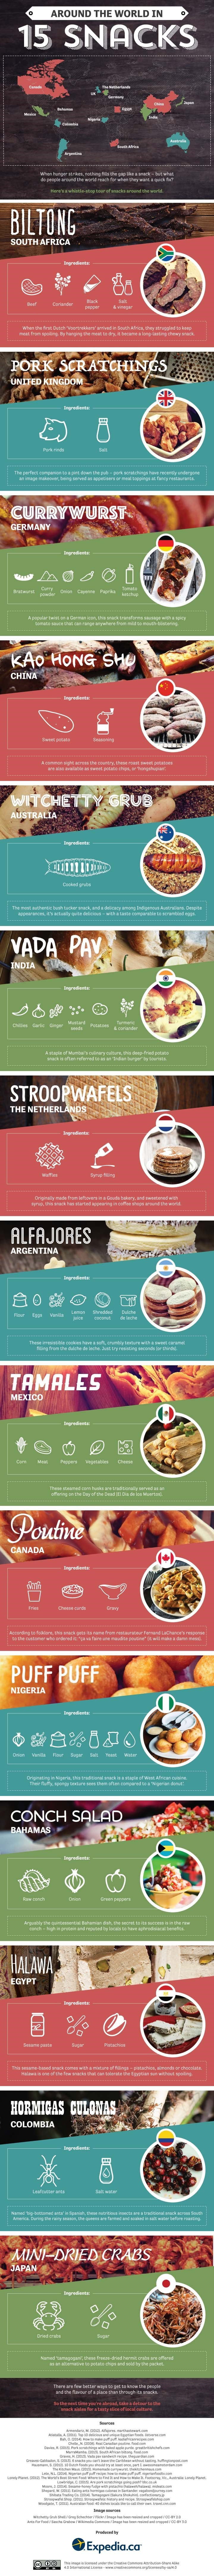 Around the World in 15 Snacks